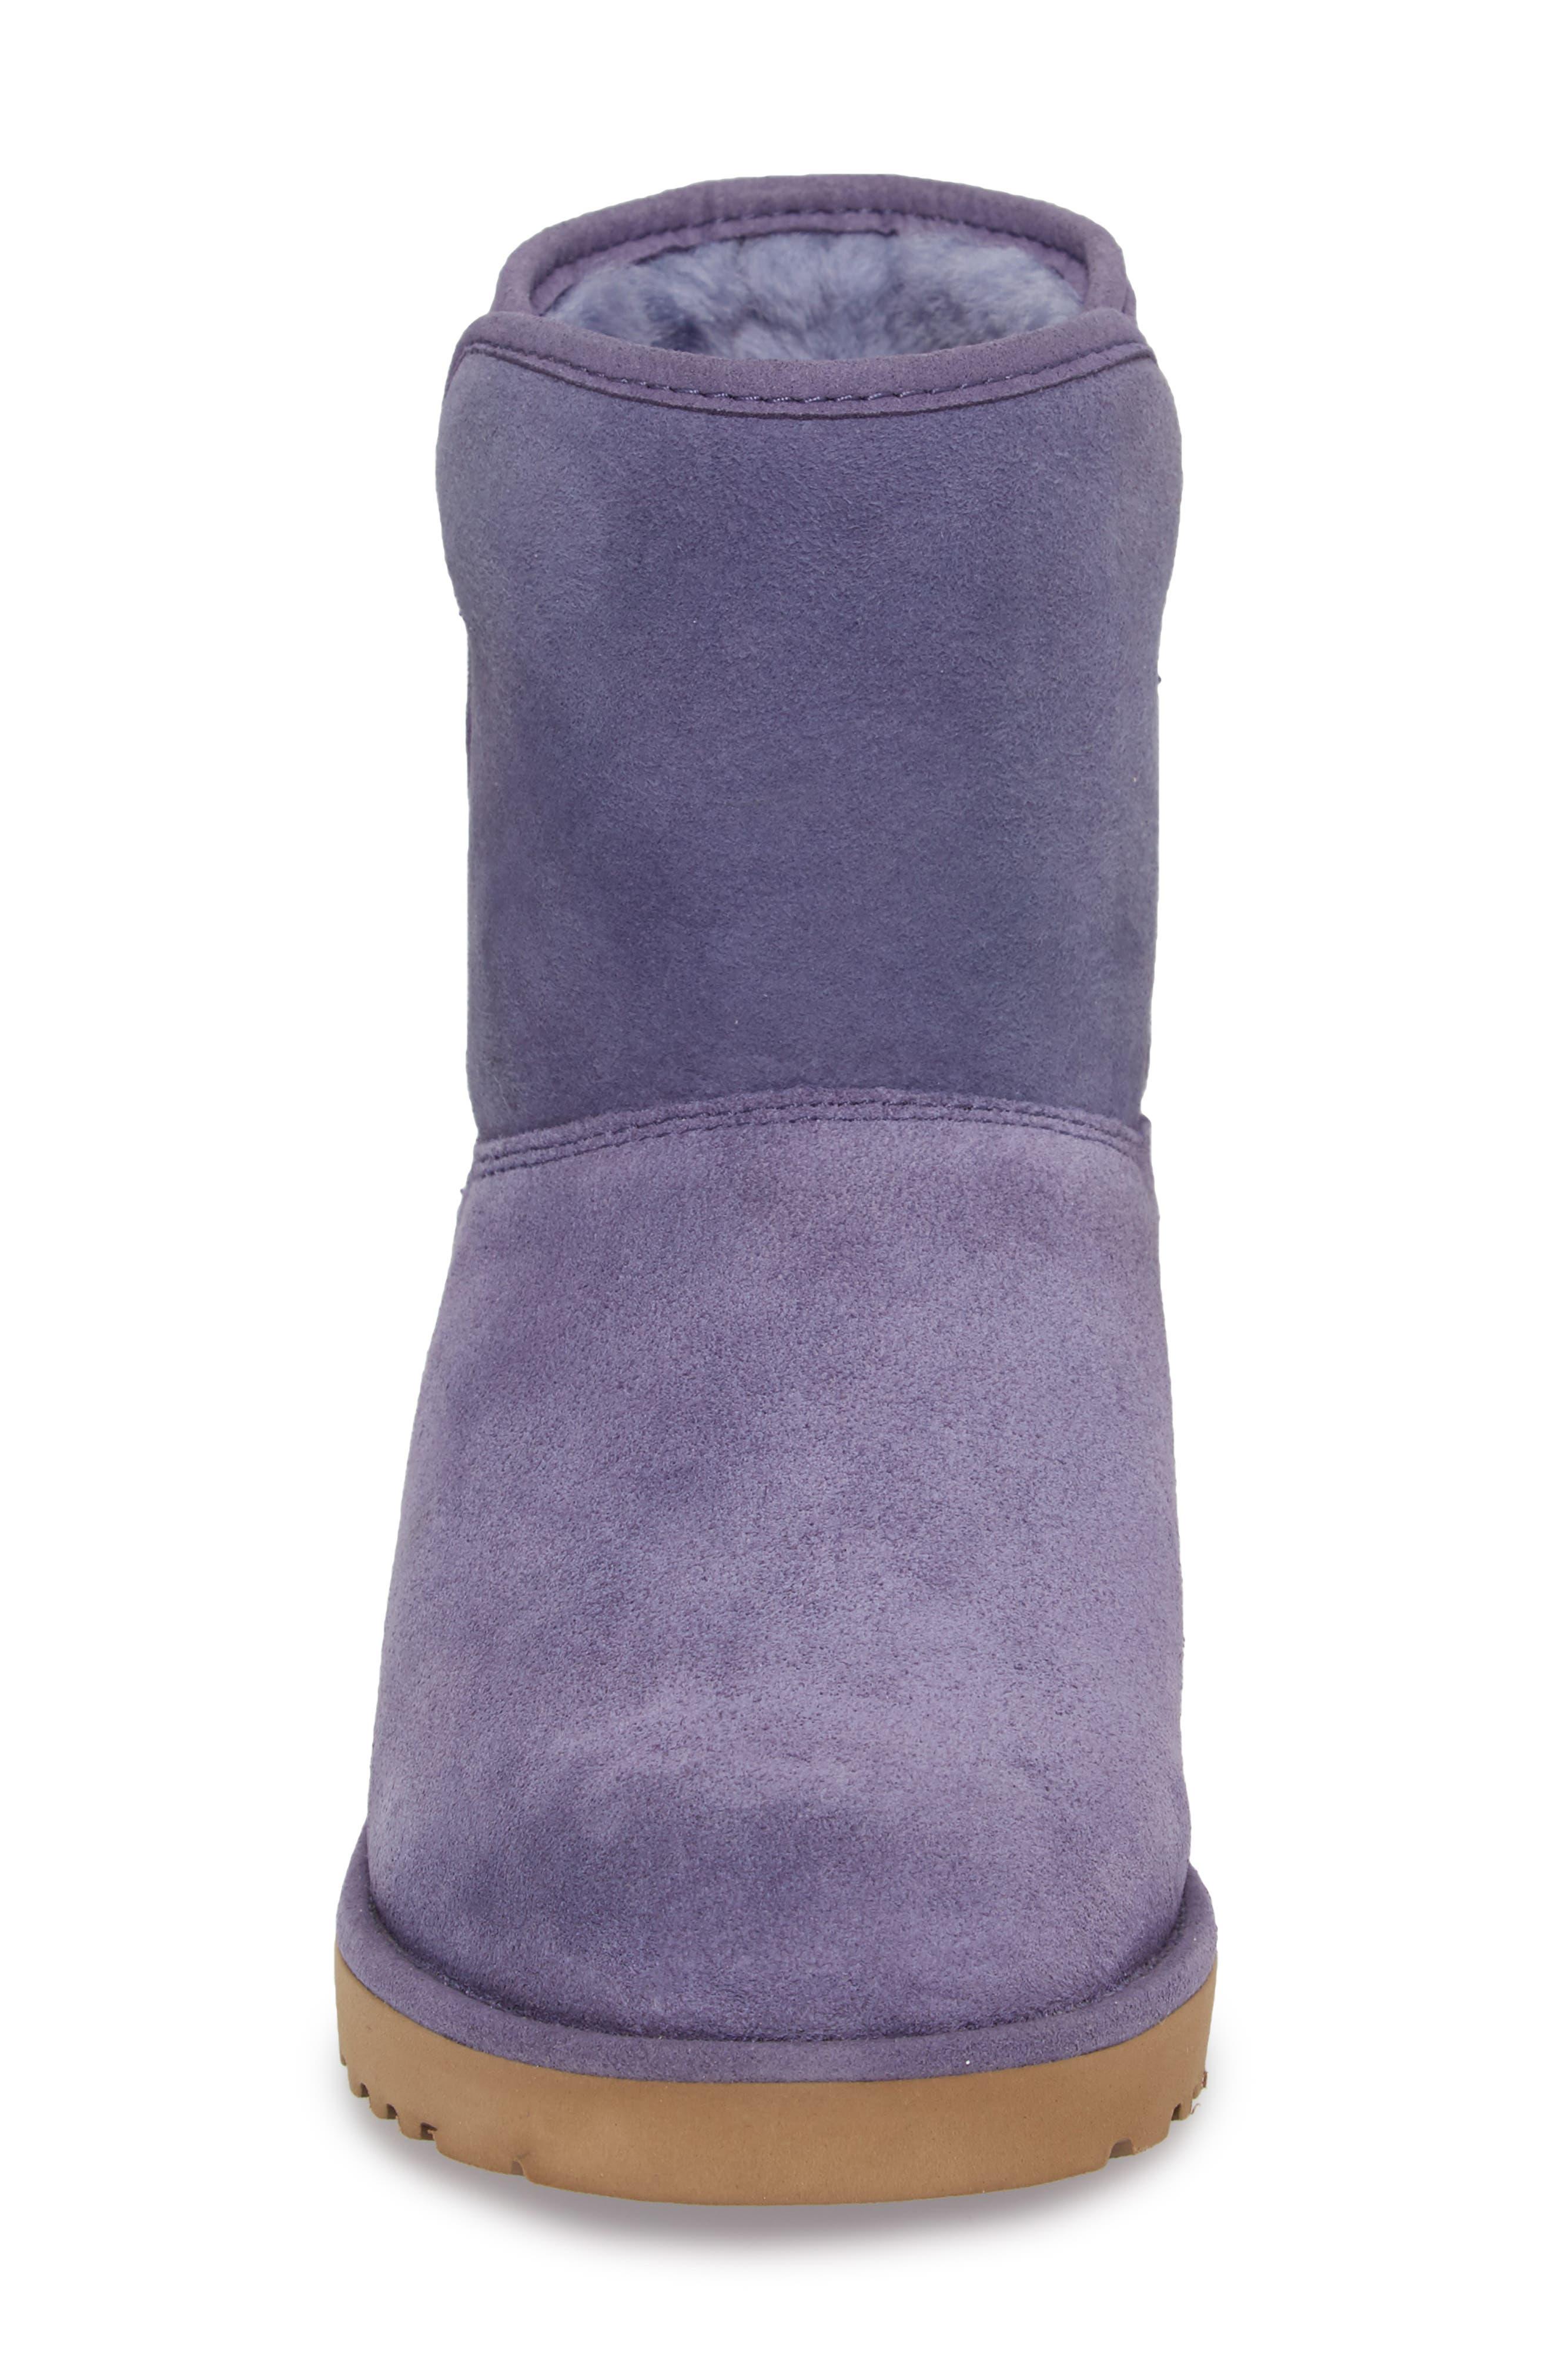 Alternate Image 4  - UGG® Kristin - Classic Slim™ Water Resistant Mini Boot (Women)